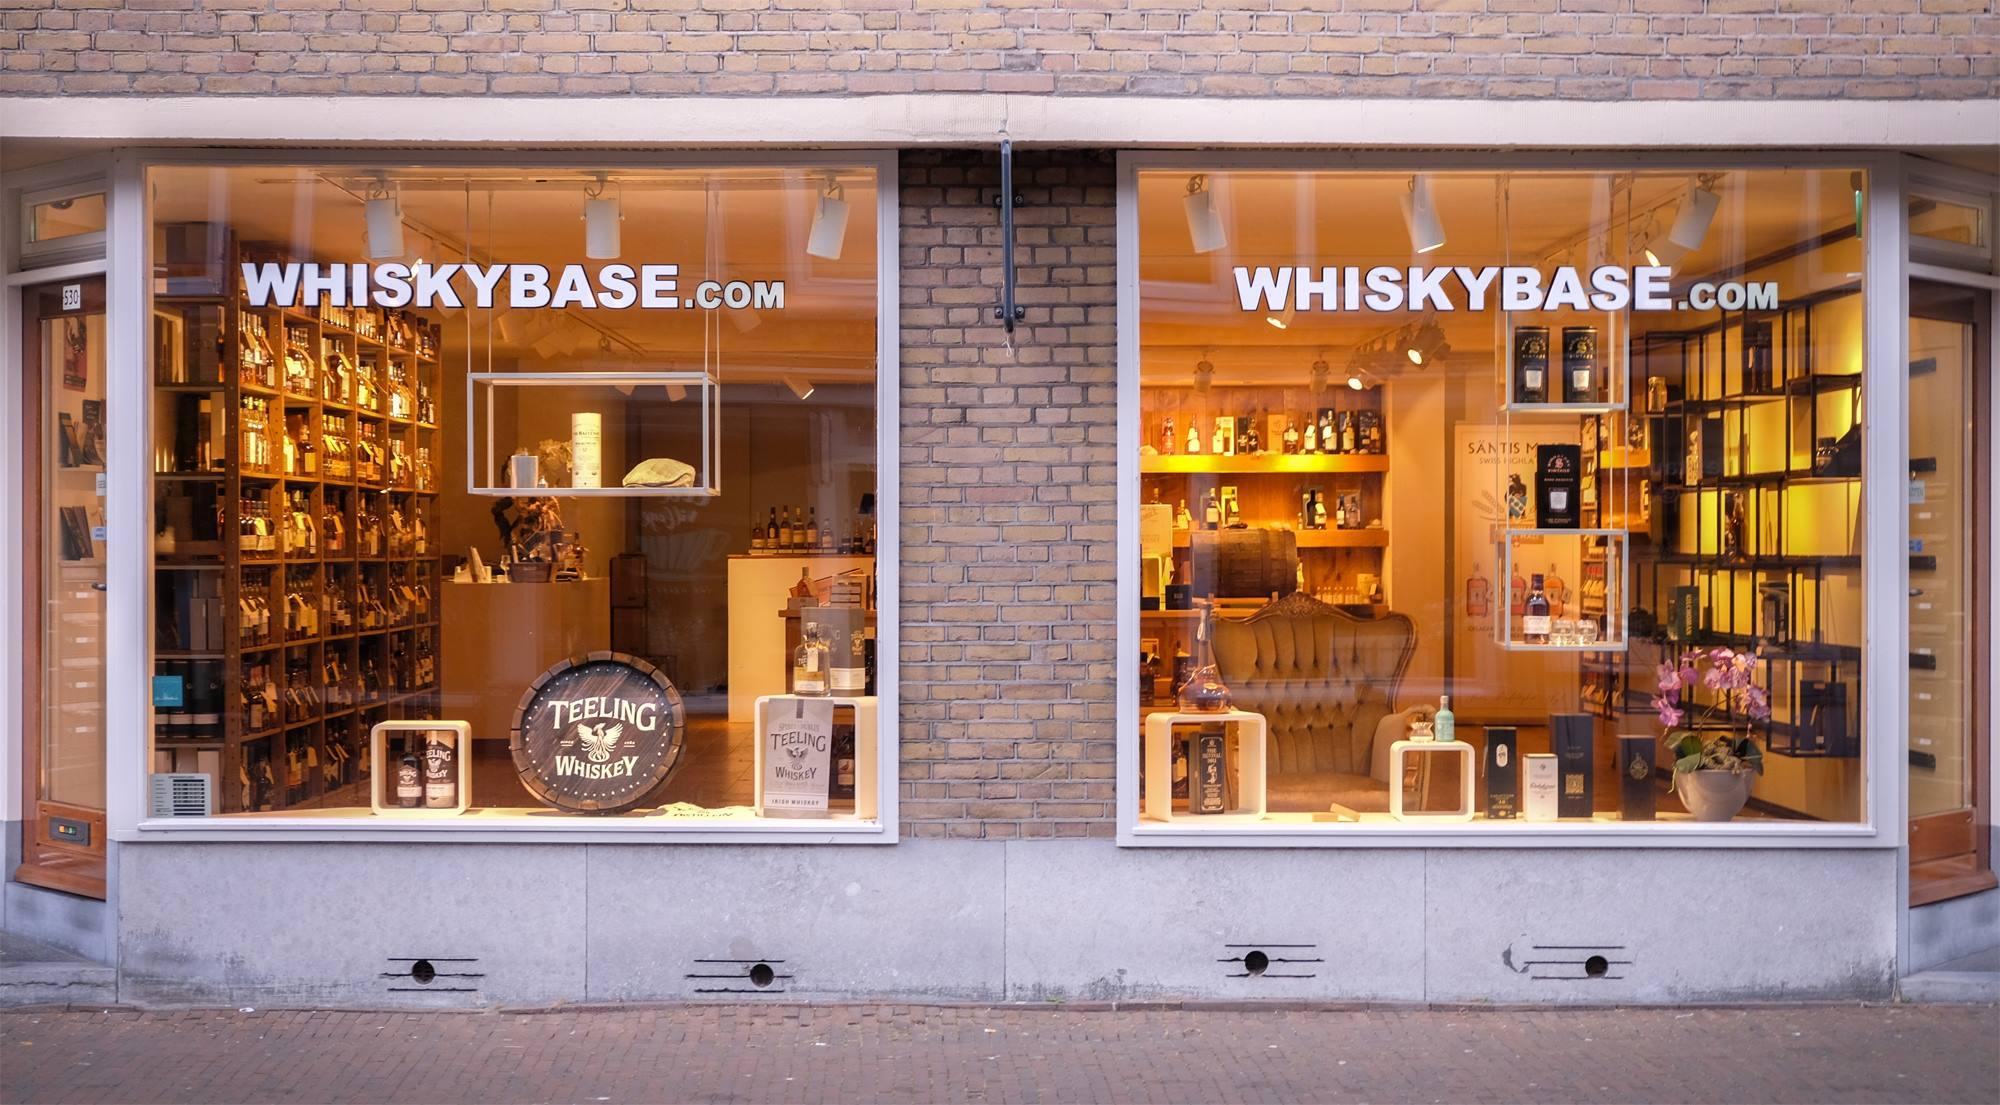 http://archiveswhisky.com/wp-content/uploads/2019/04/Whiskybase-Winkel.jpg